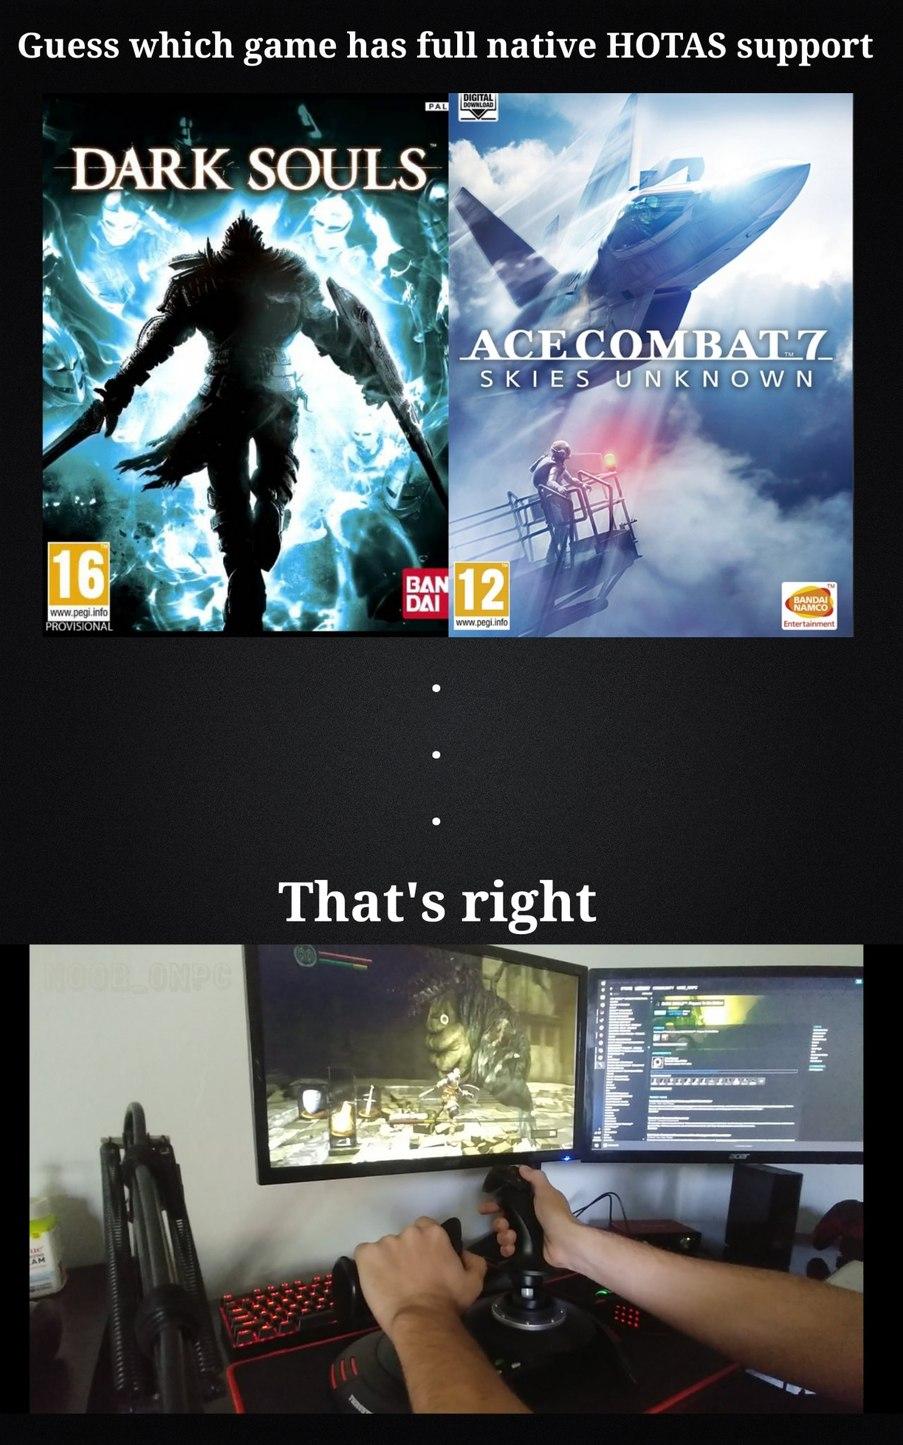 Dark Souls is the ultimate flight sim - meme